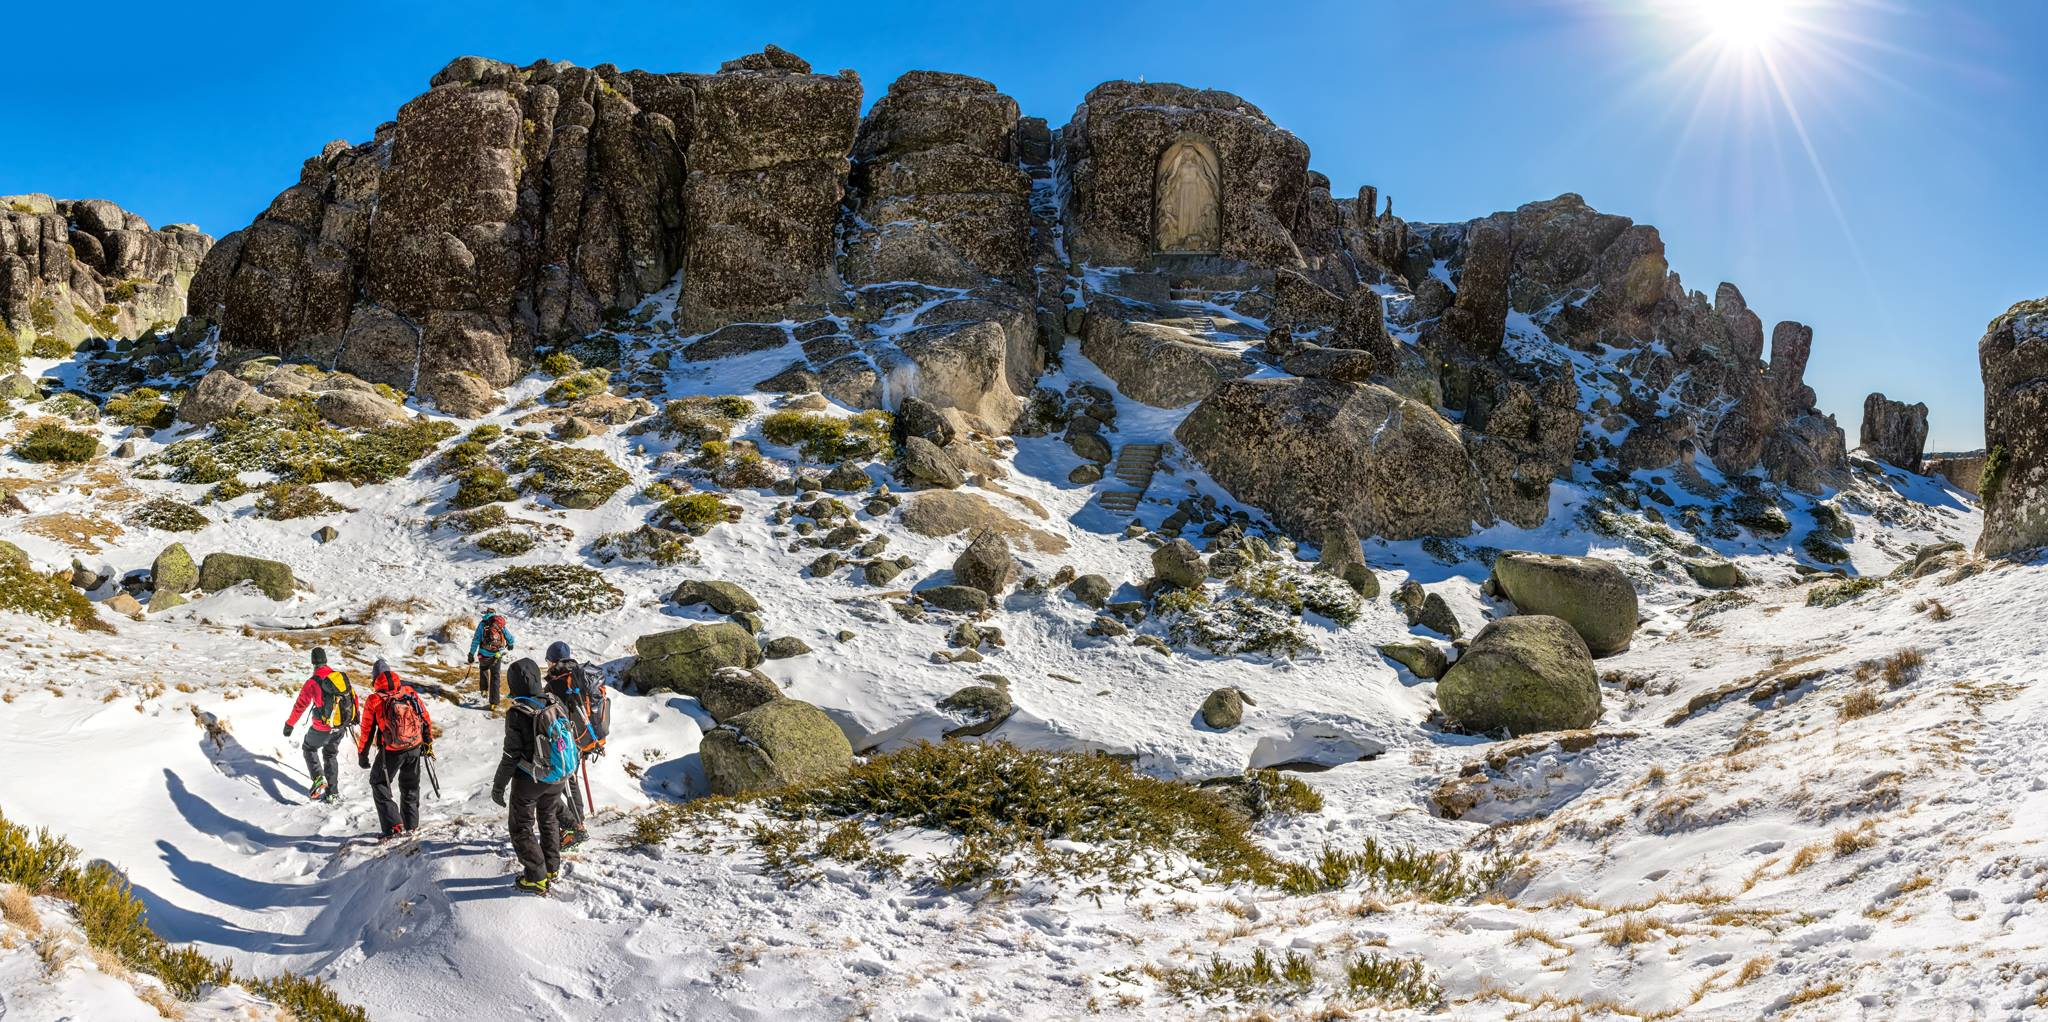 Trekking Vale Glaciar do Zêzere